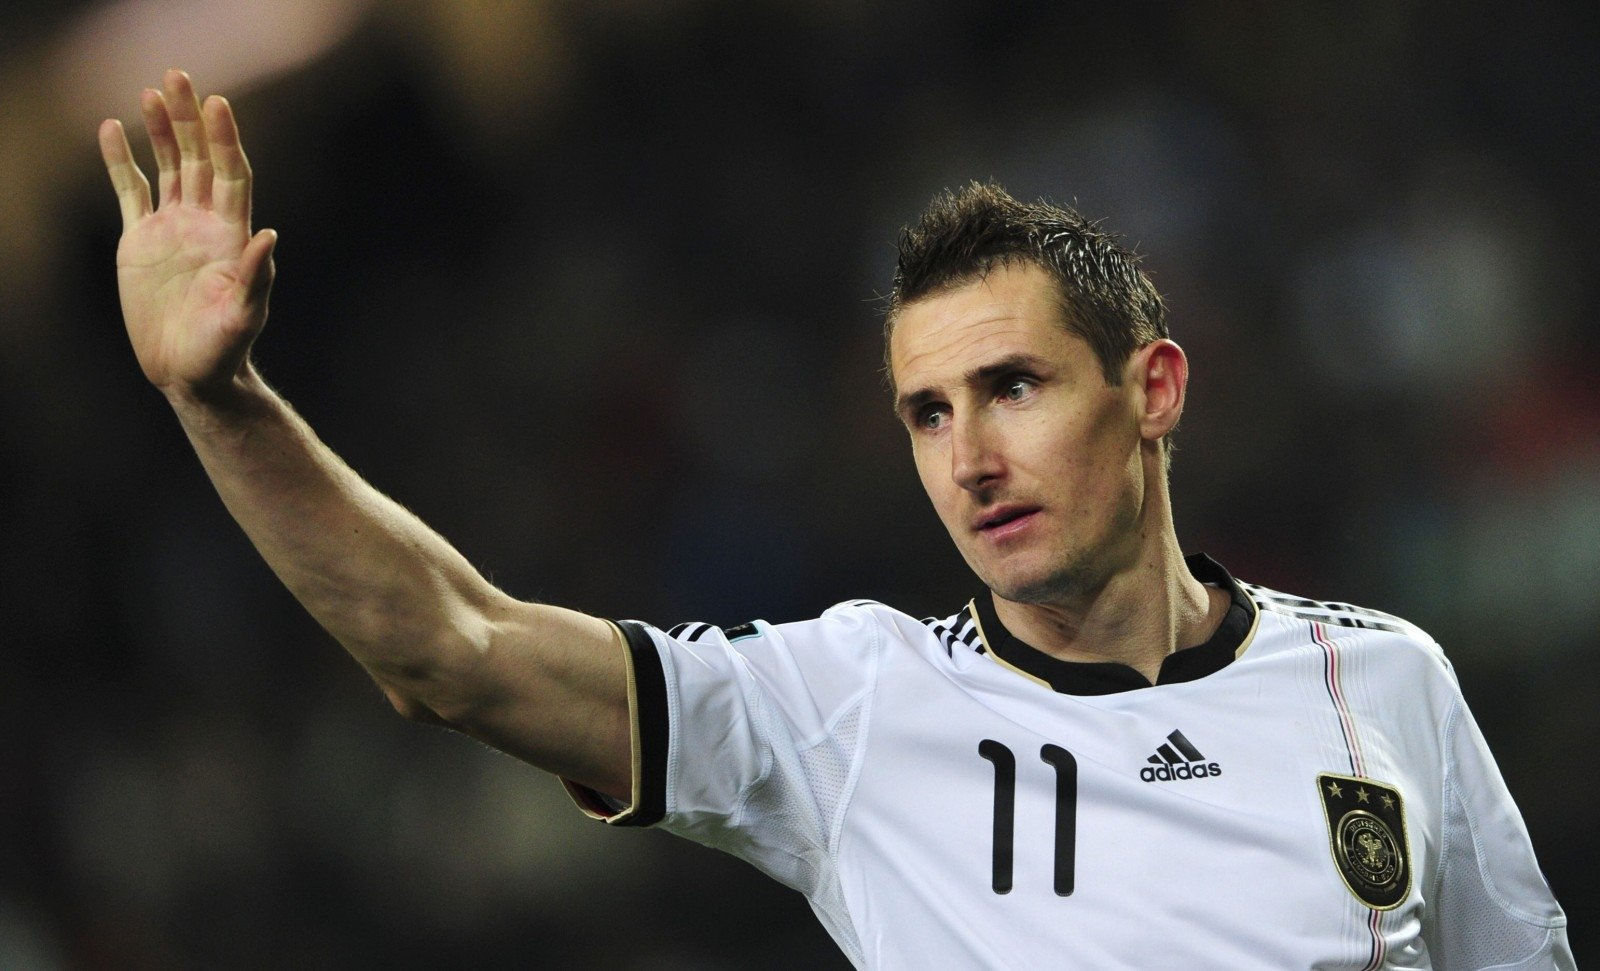 Лучший бомбардир висторииЧМ Клозе завершил карьеру футболиста